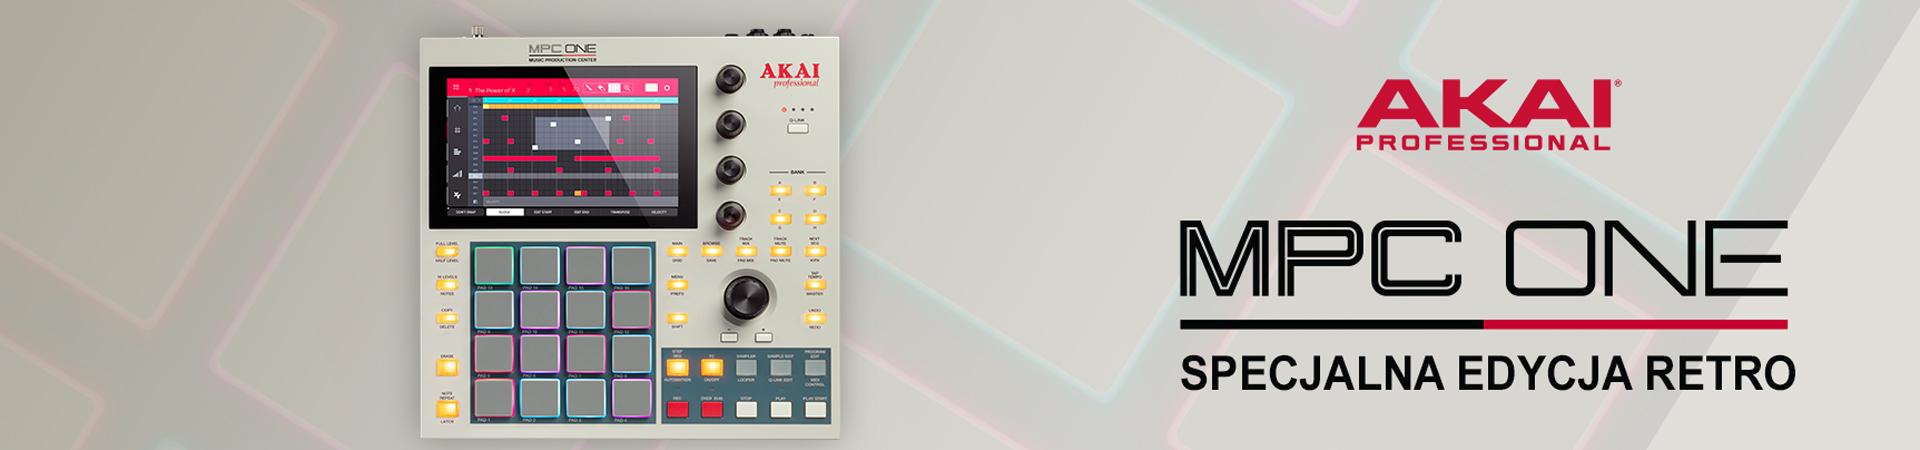 PREMIERA: MPC One Retro z Akai Professional!